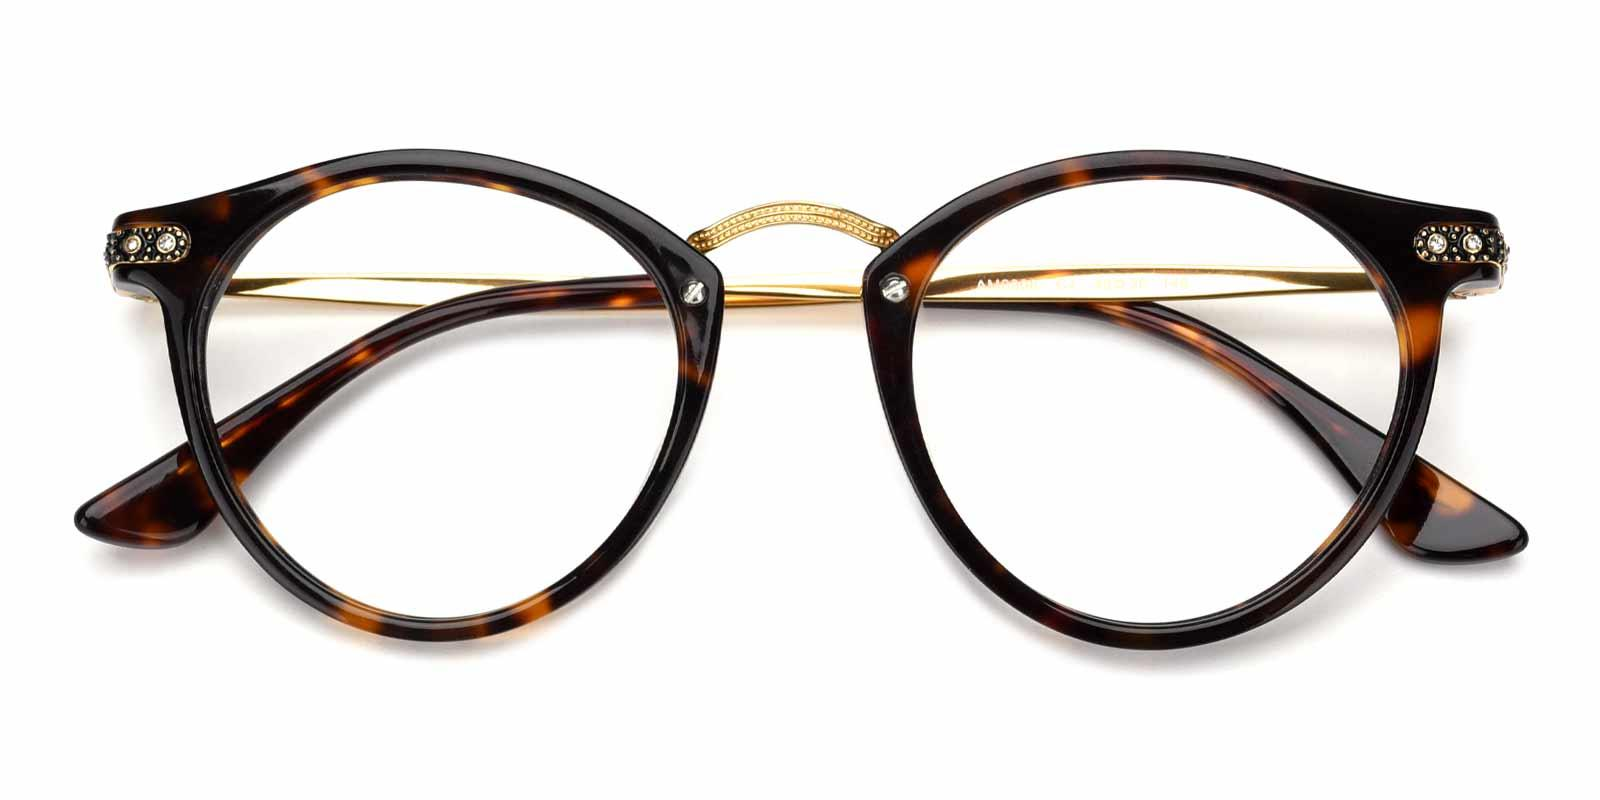 Donna-Tortoise-Round-Acetate-Eyeglasses-detail